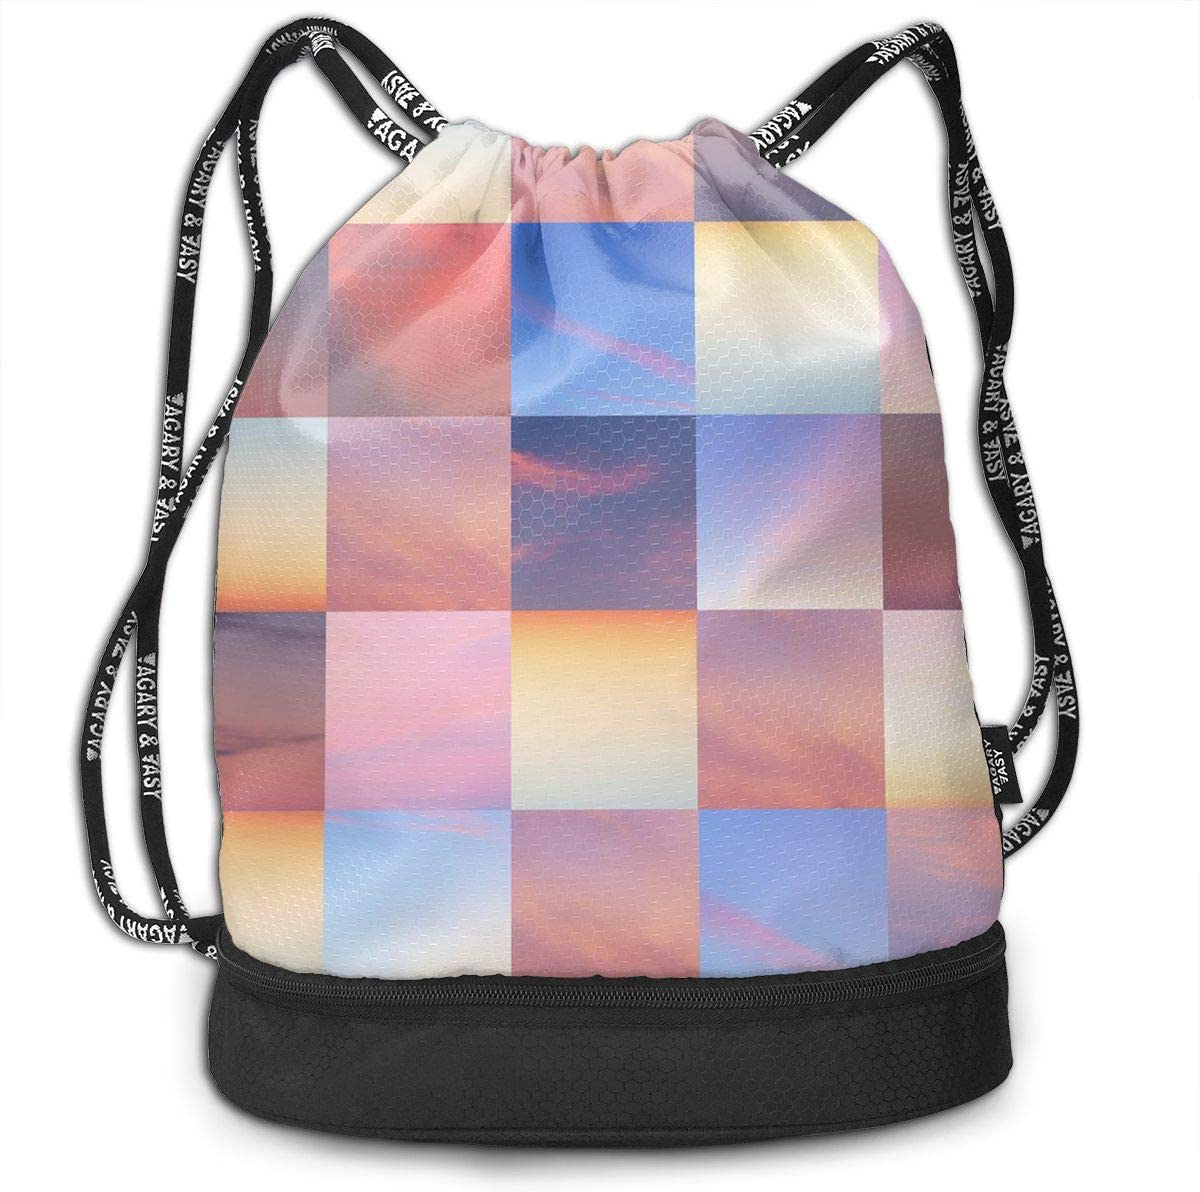 HUOPR5Q Heart Grey Yellow Drawstring Backpack Sport Gym Sack Shoulder Bulk Bag Dance Bag for School Travel